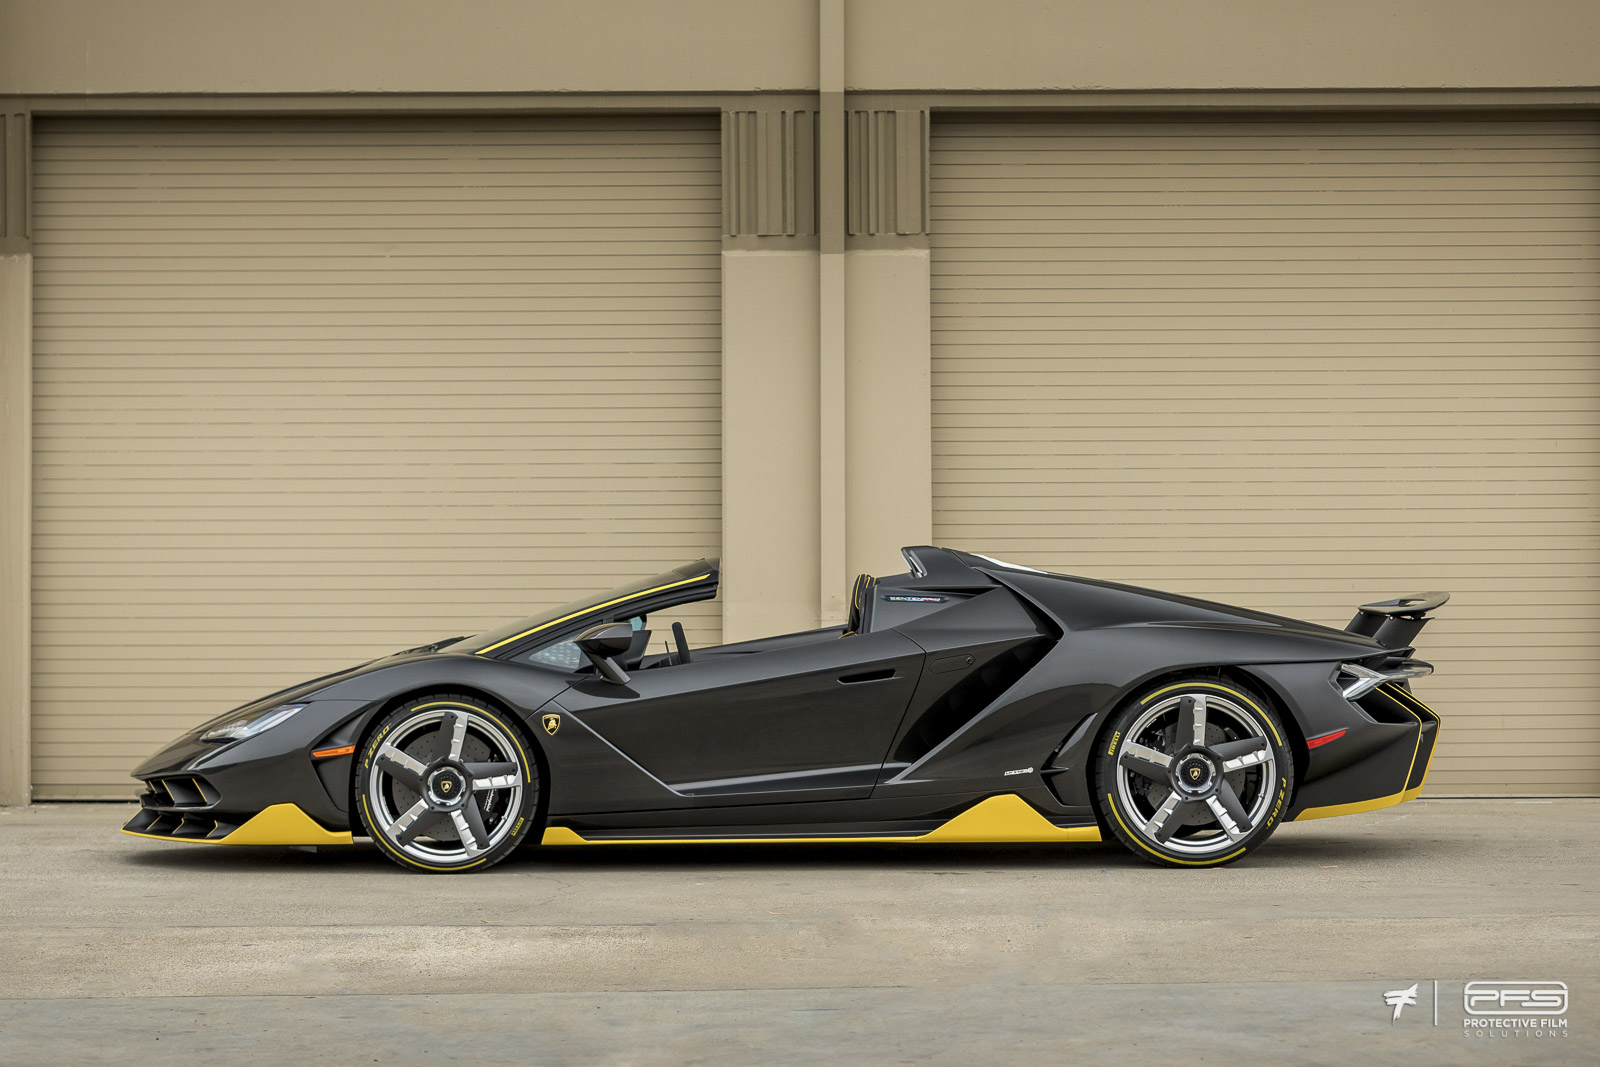 Lamborghini Centenario Paint Protected by PFS